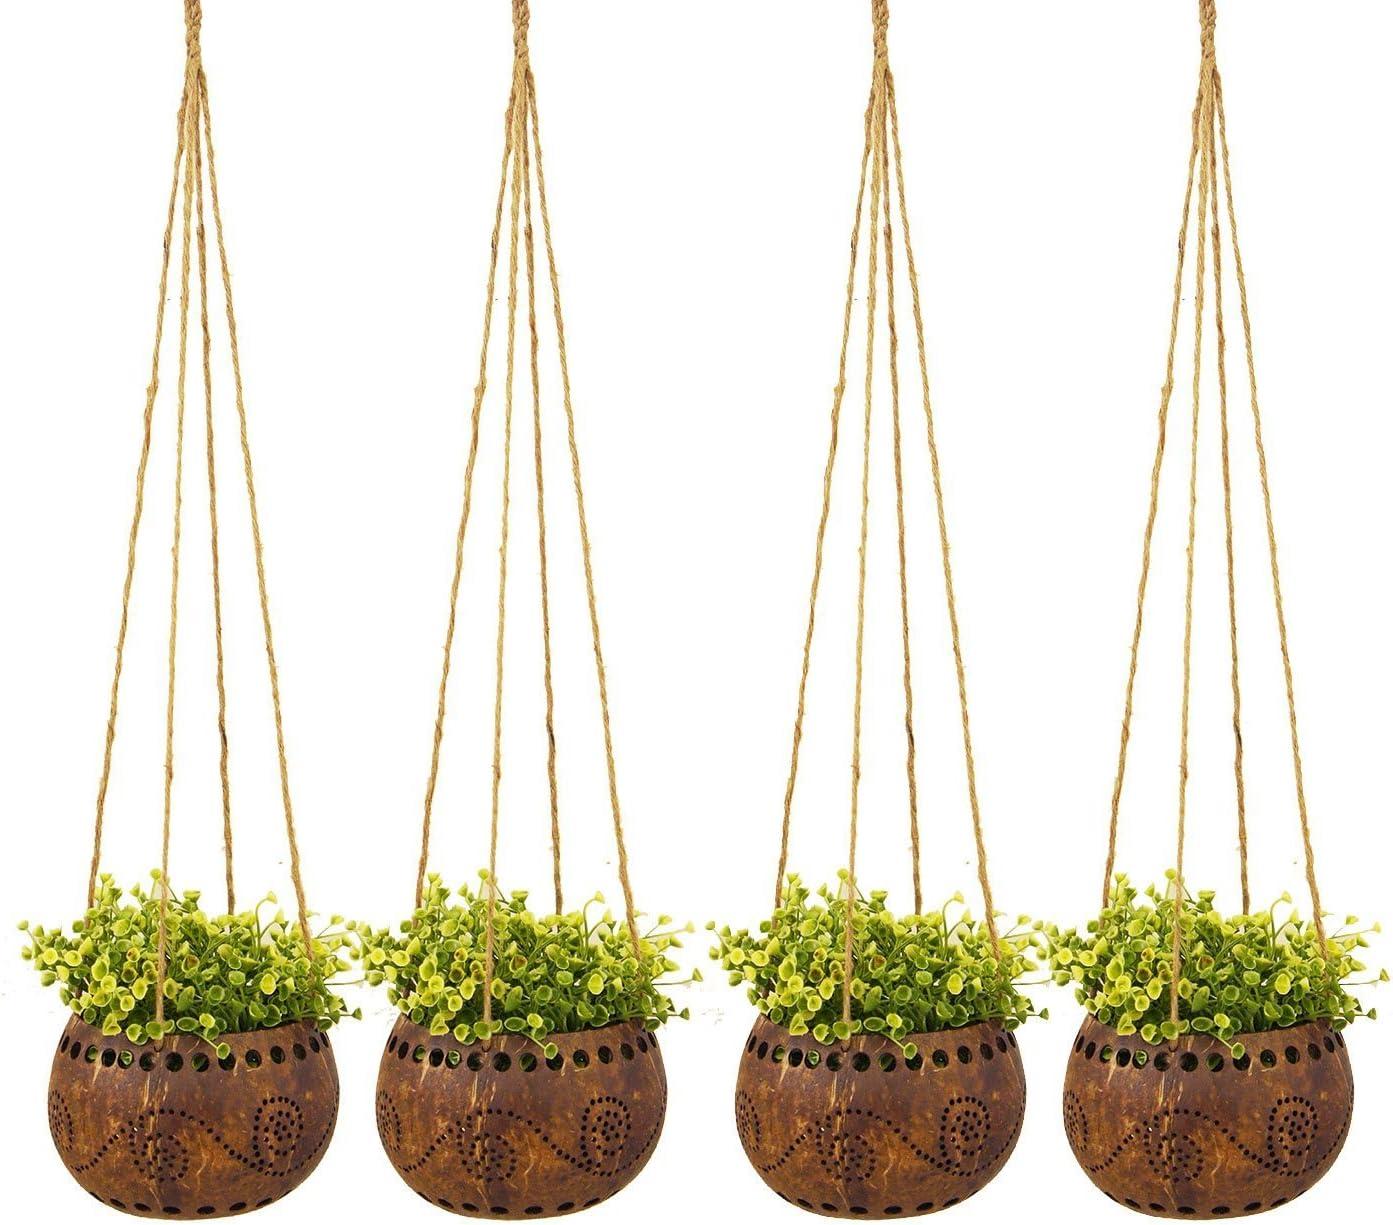 Exotic Elegance Manufacturer direct delivery Set of 4 Garden Shell Decorative Coconut Hang 4